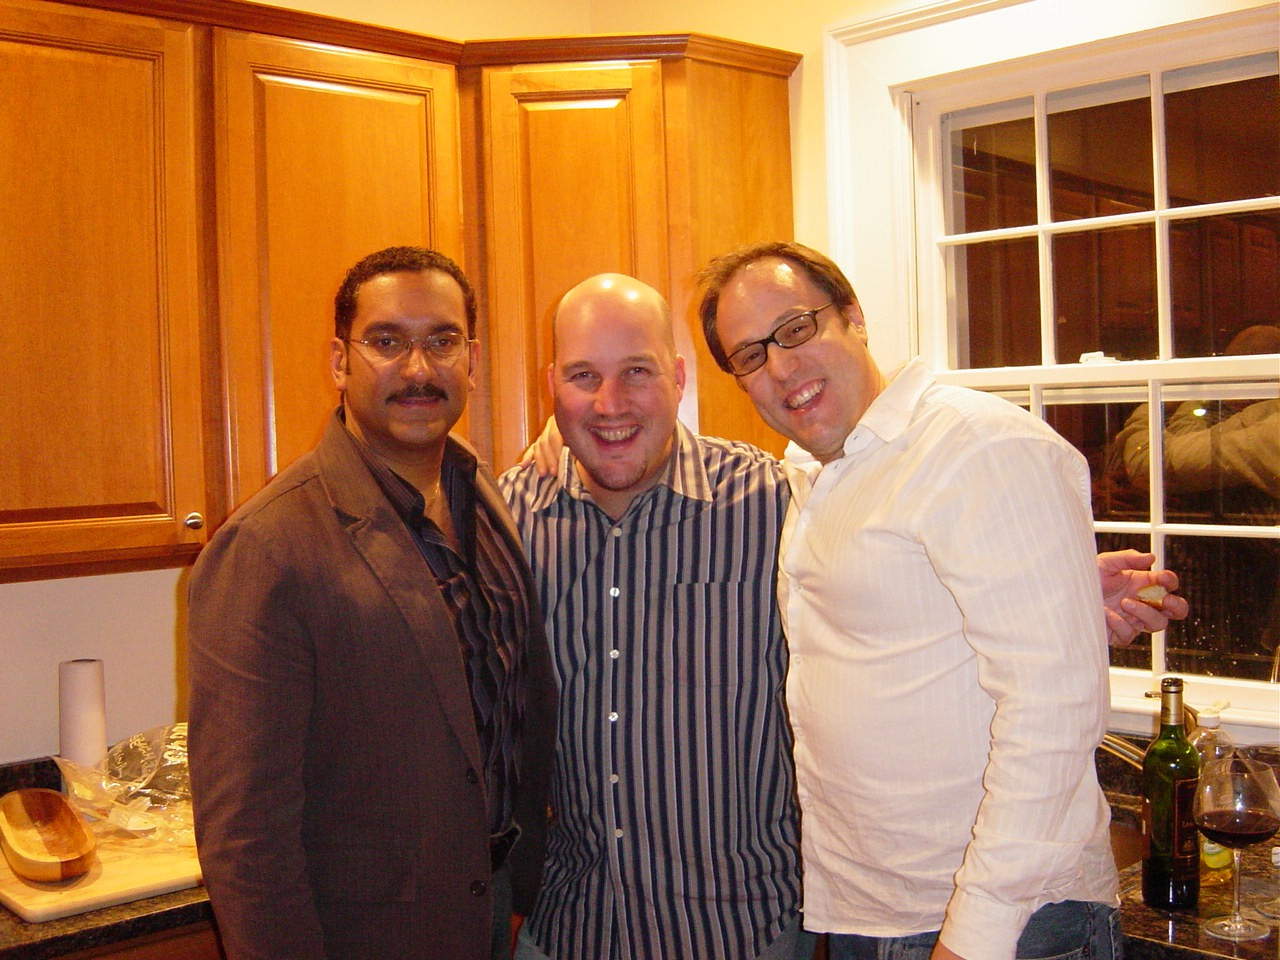 Richard Clark & Paul Umbach in Boston, MA